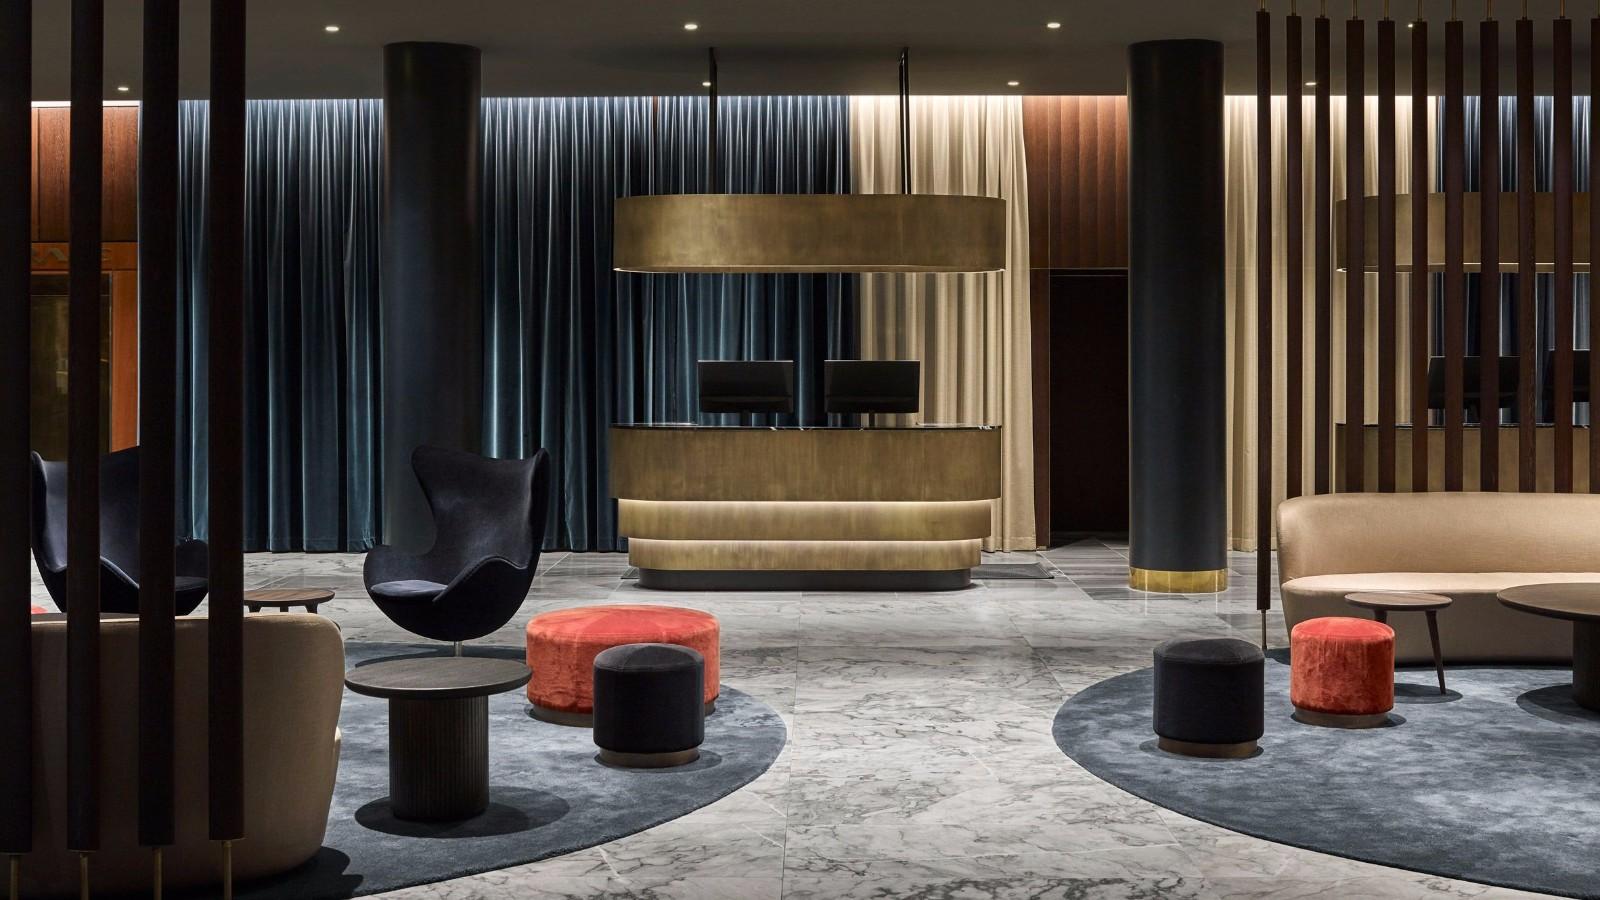 创意hotel装饰设计